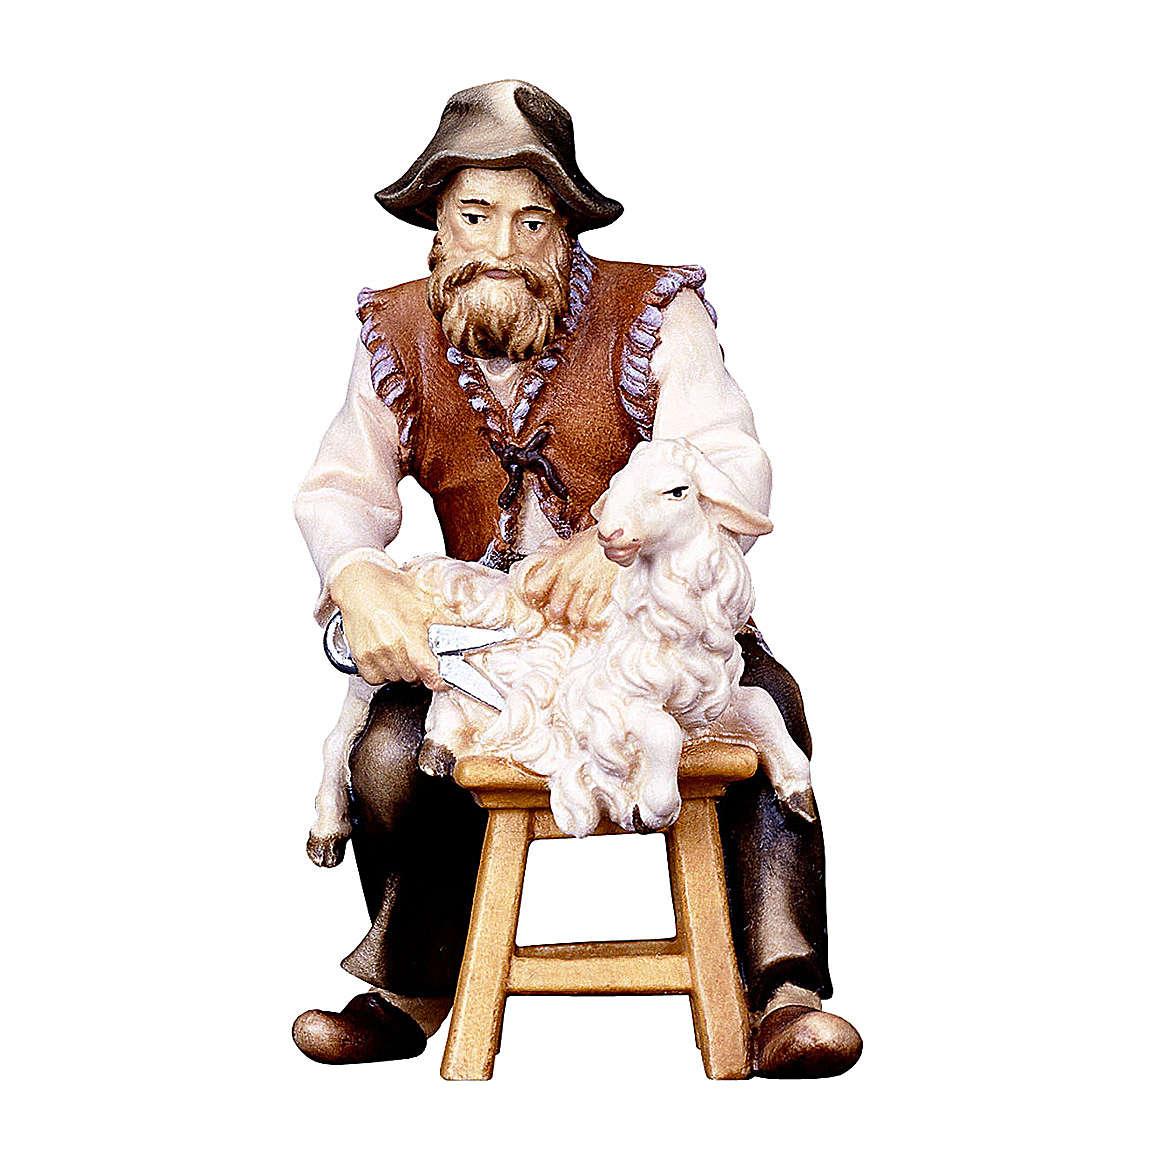 Pecoraio seduto presepe Original Pastore legno dipinto in Val Gardena 12 cm 4